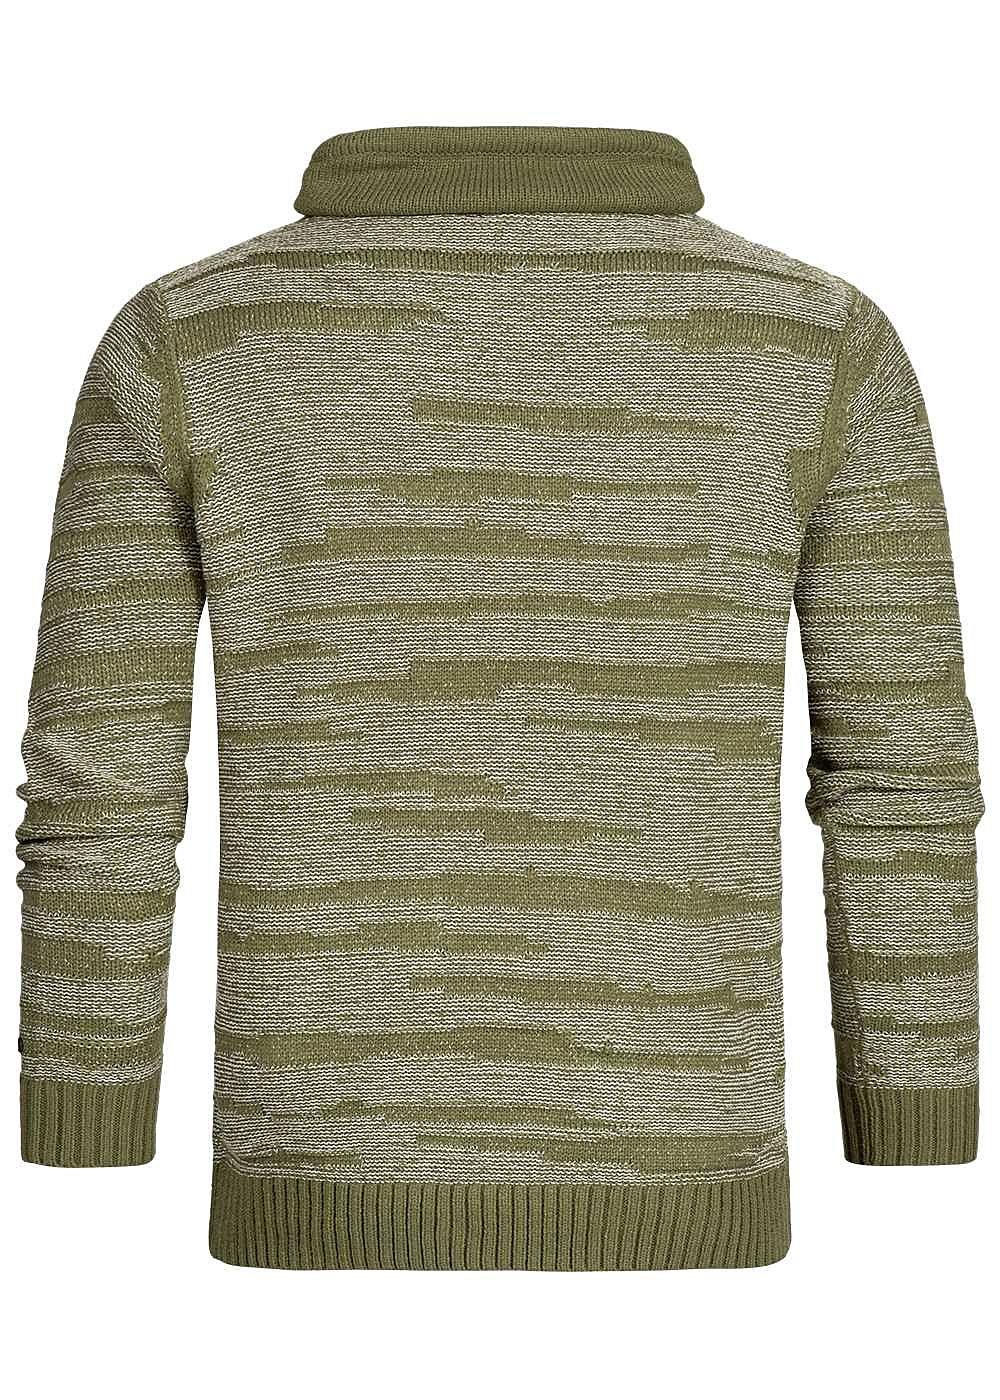 4c5d7afcabc80 Hailys Men High-Neck Sweater khaki grün weiss - 77onlineshop